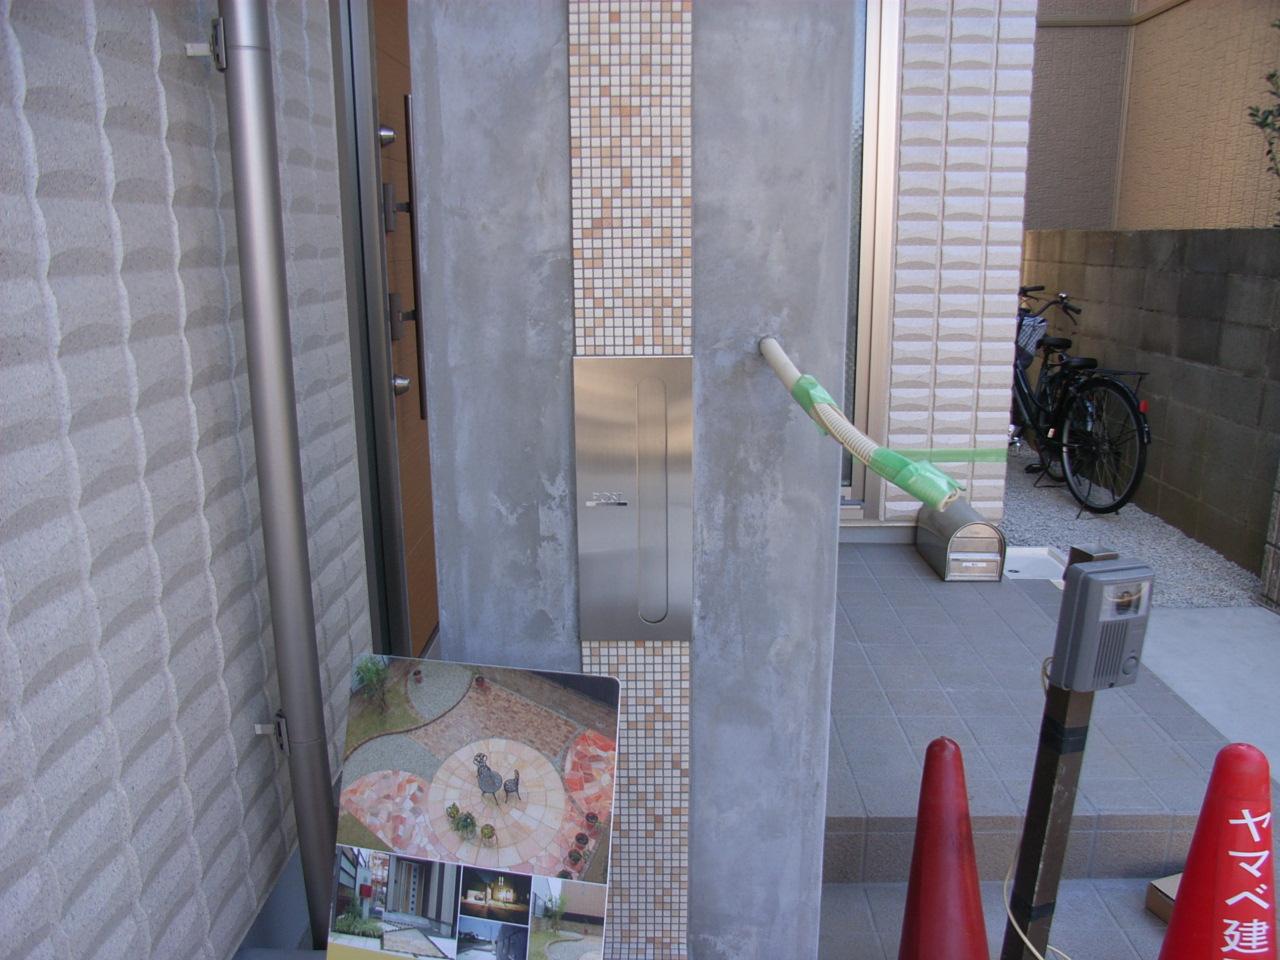 20091219 003